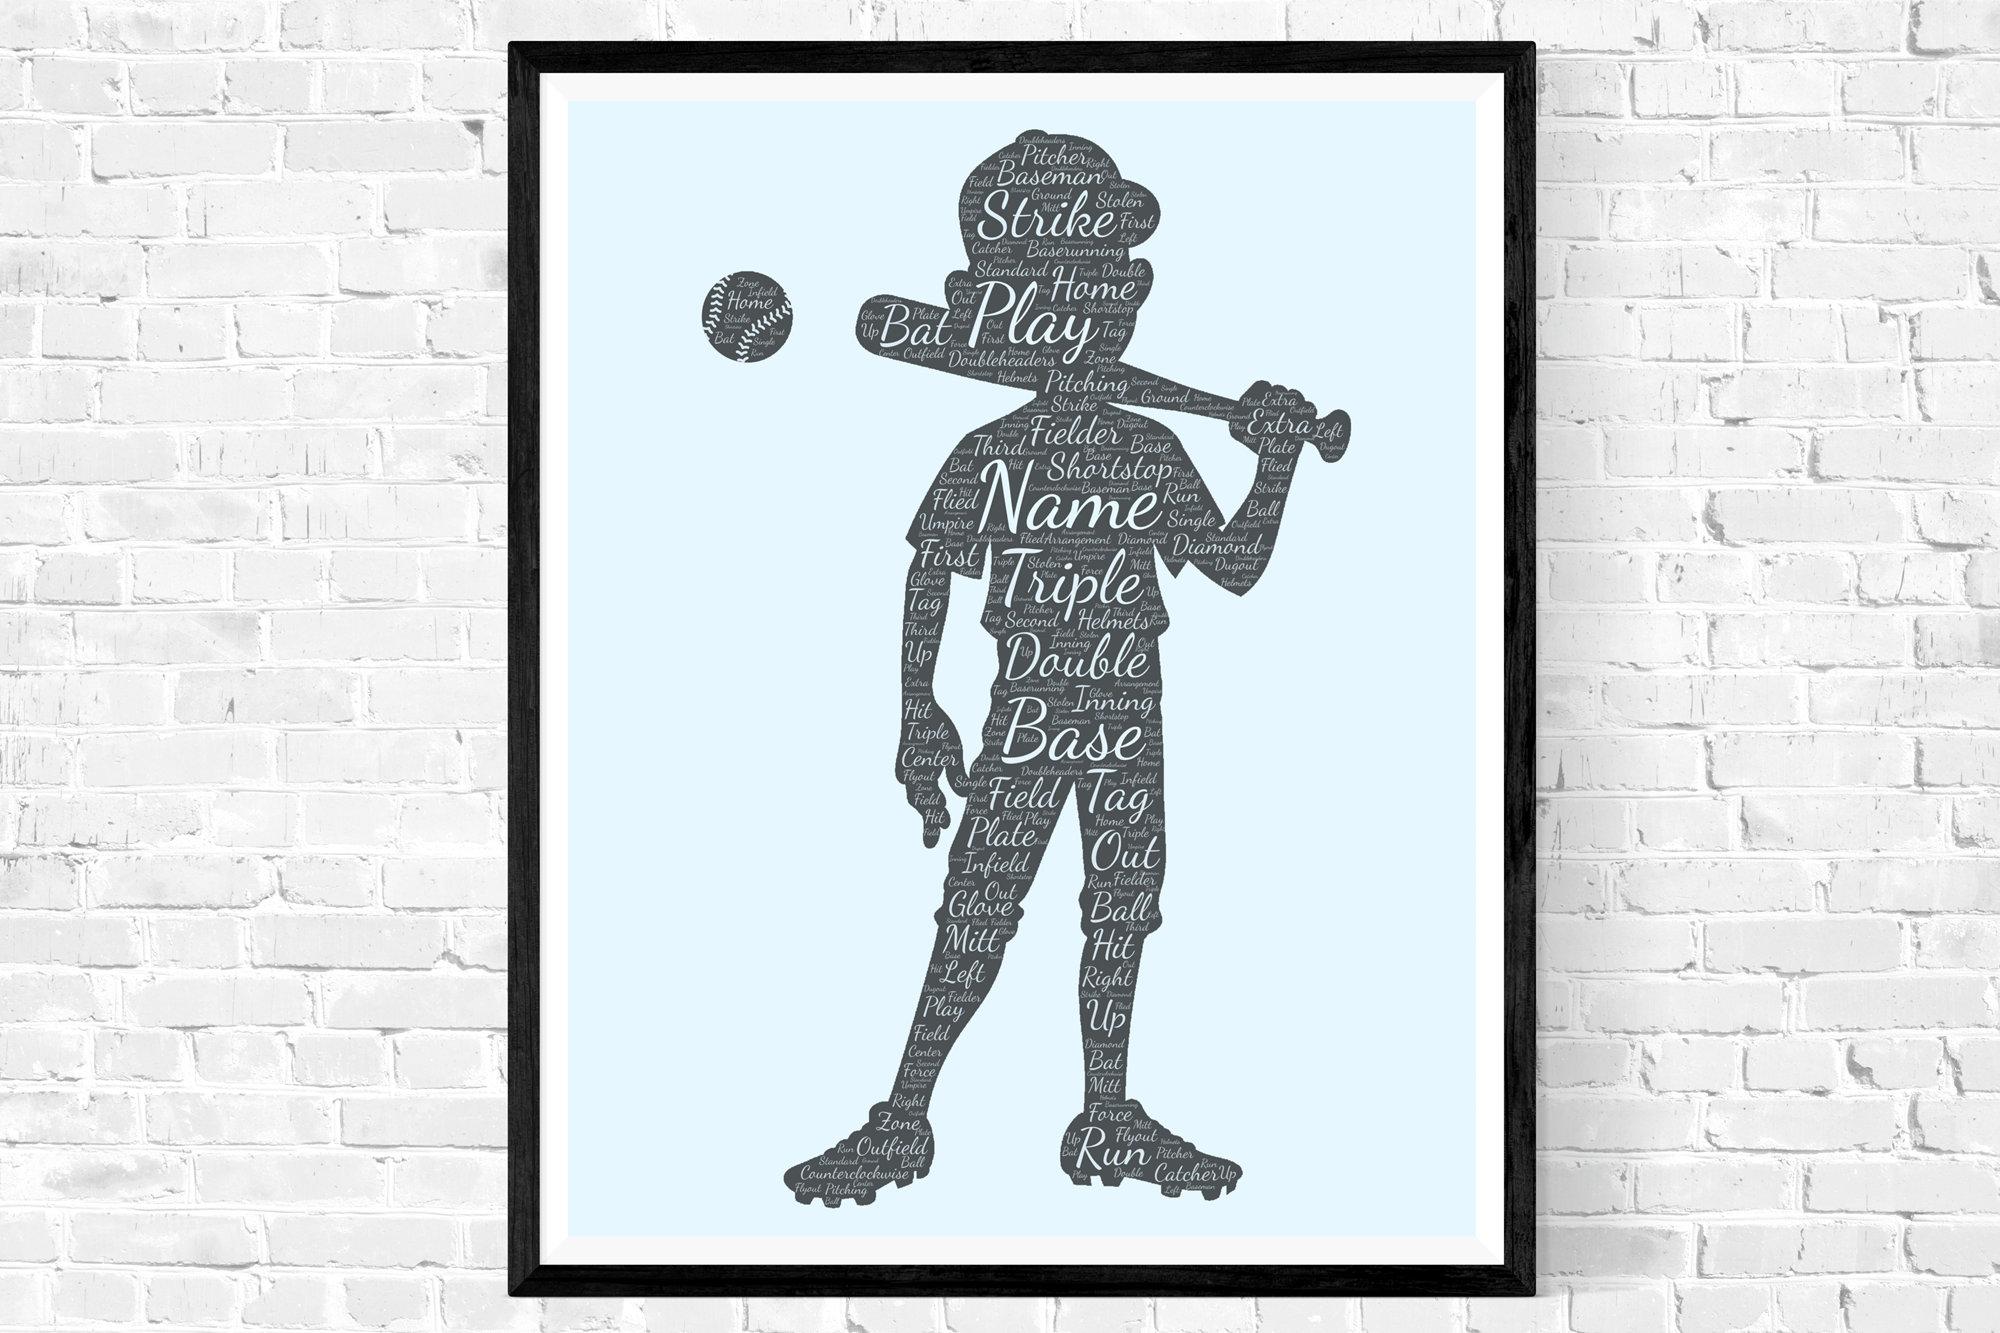 Baseball Wall Decor Print - Batsman Gifts - Gifts for him -  Dad- Uncle Brother Husband - Word Cloud Wall Art Prints - Personalised